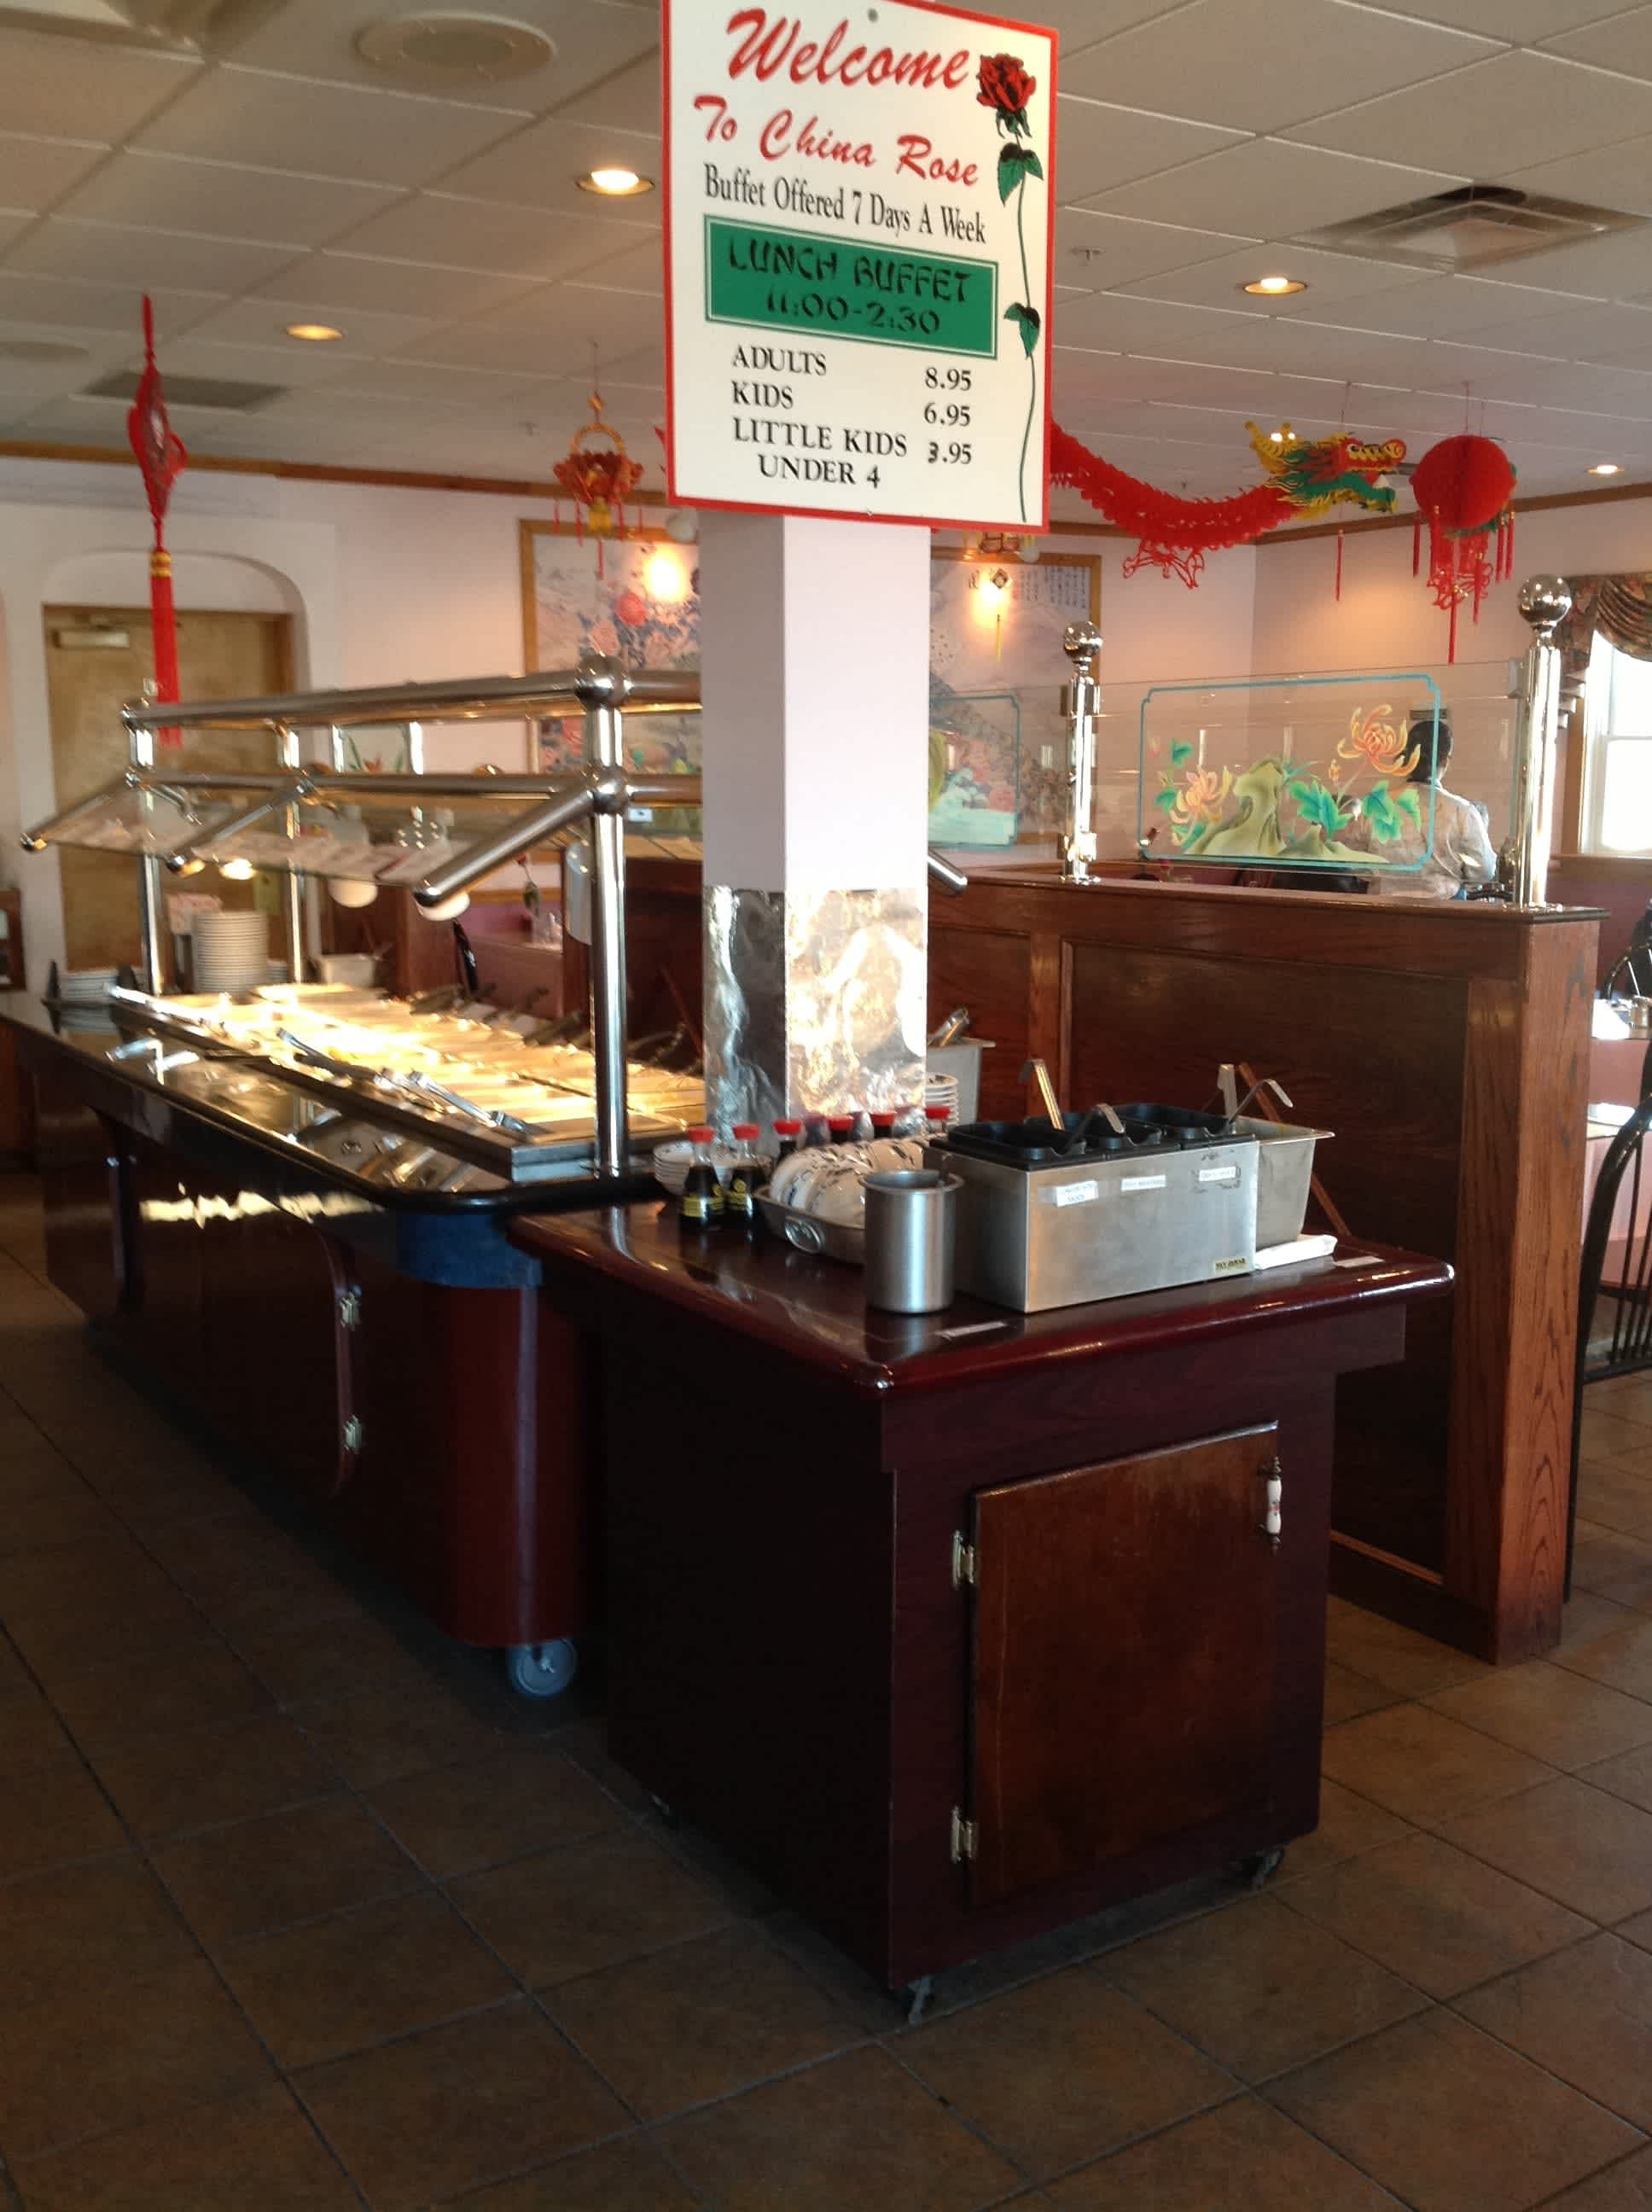 China Rose Restaurant Menu Amp Reviews Freeport 04032